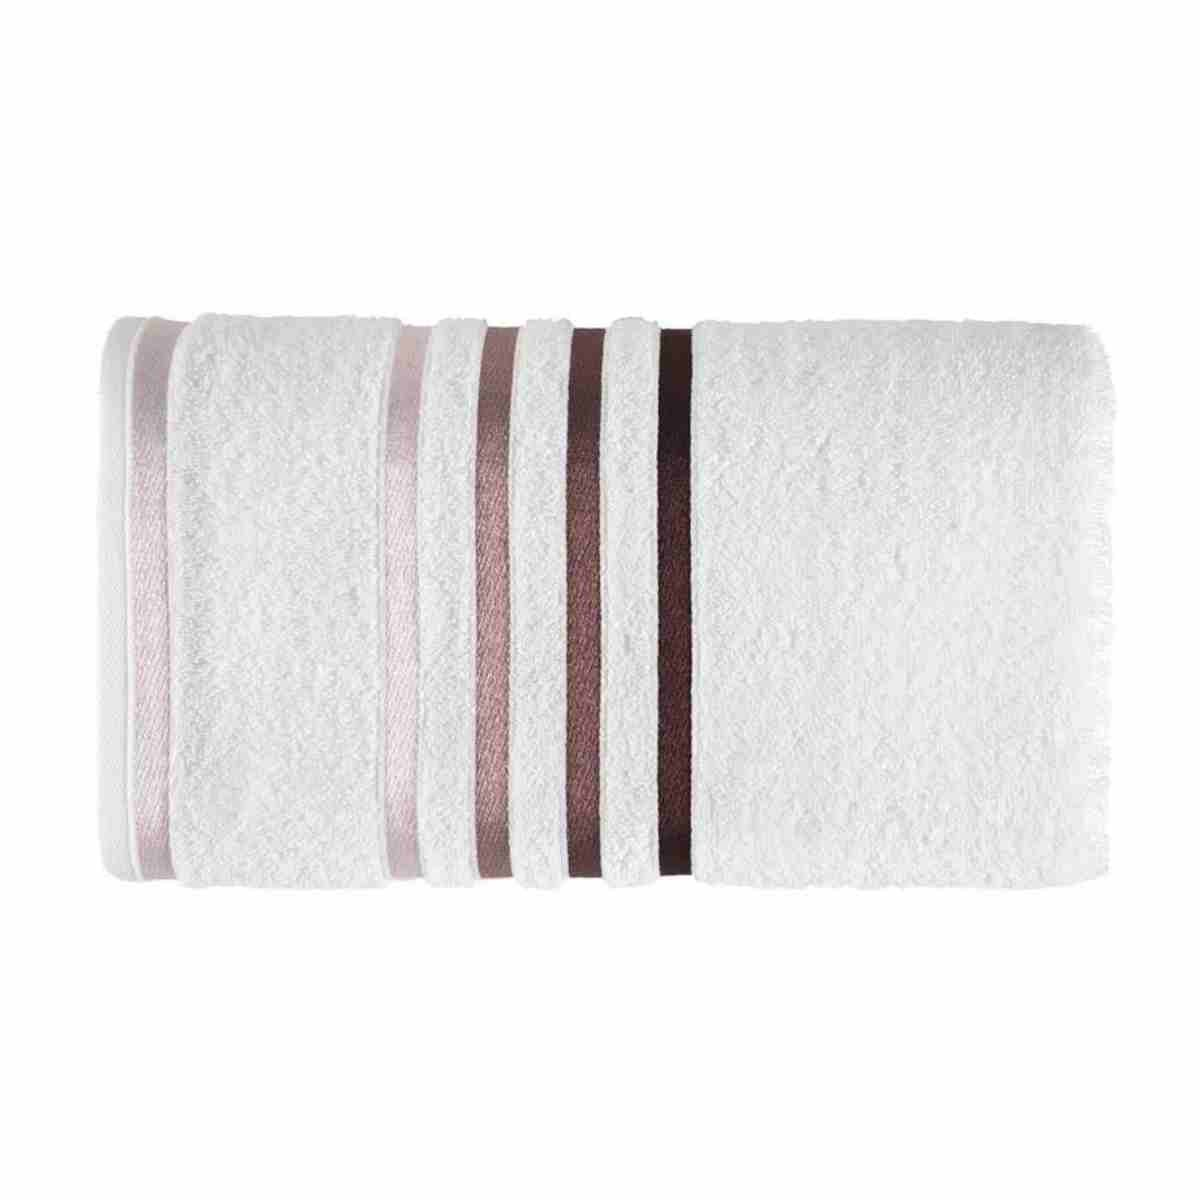 Toalha de Banho Lumina 70x140 Branco/Roxo